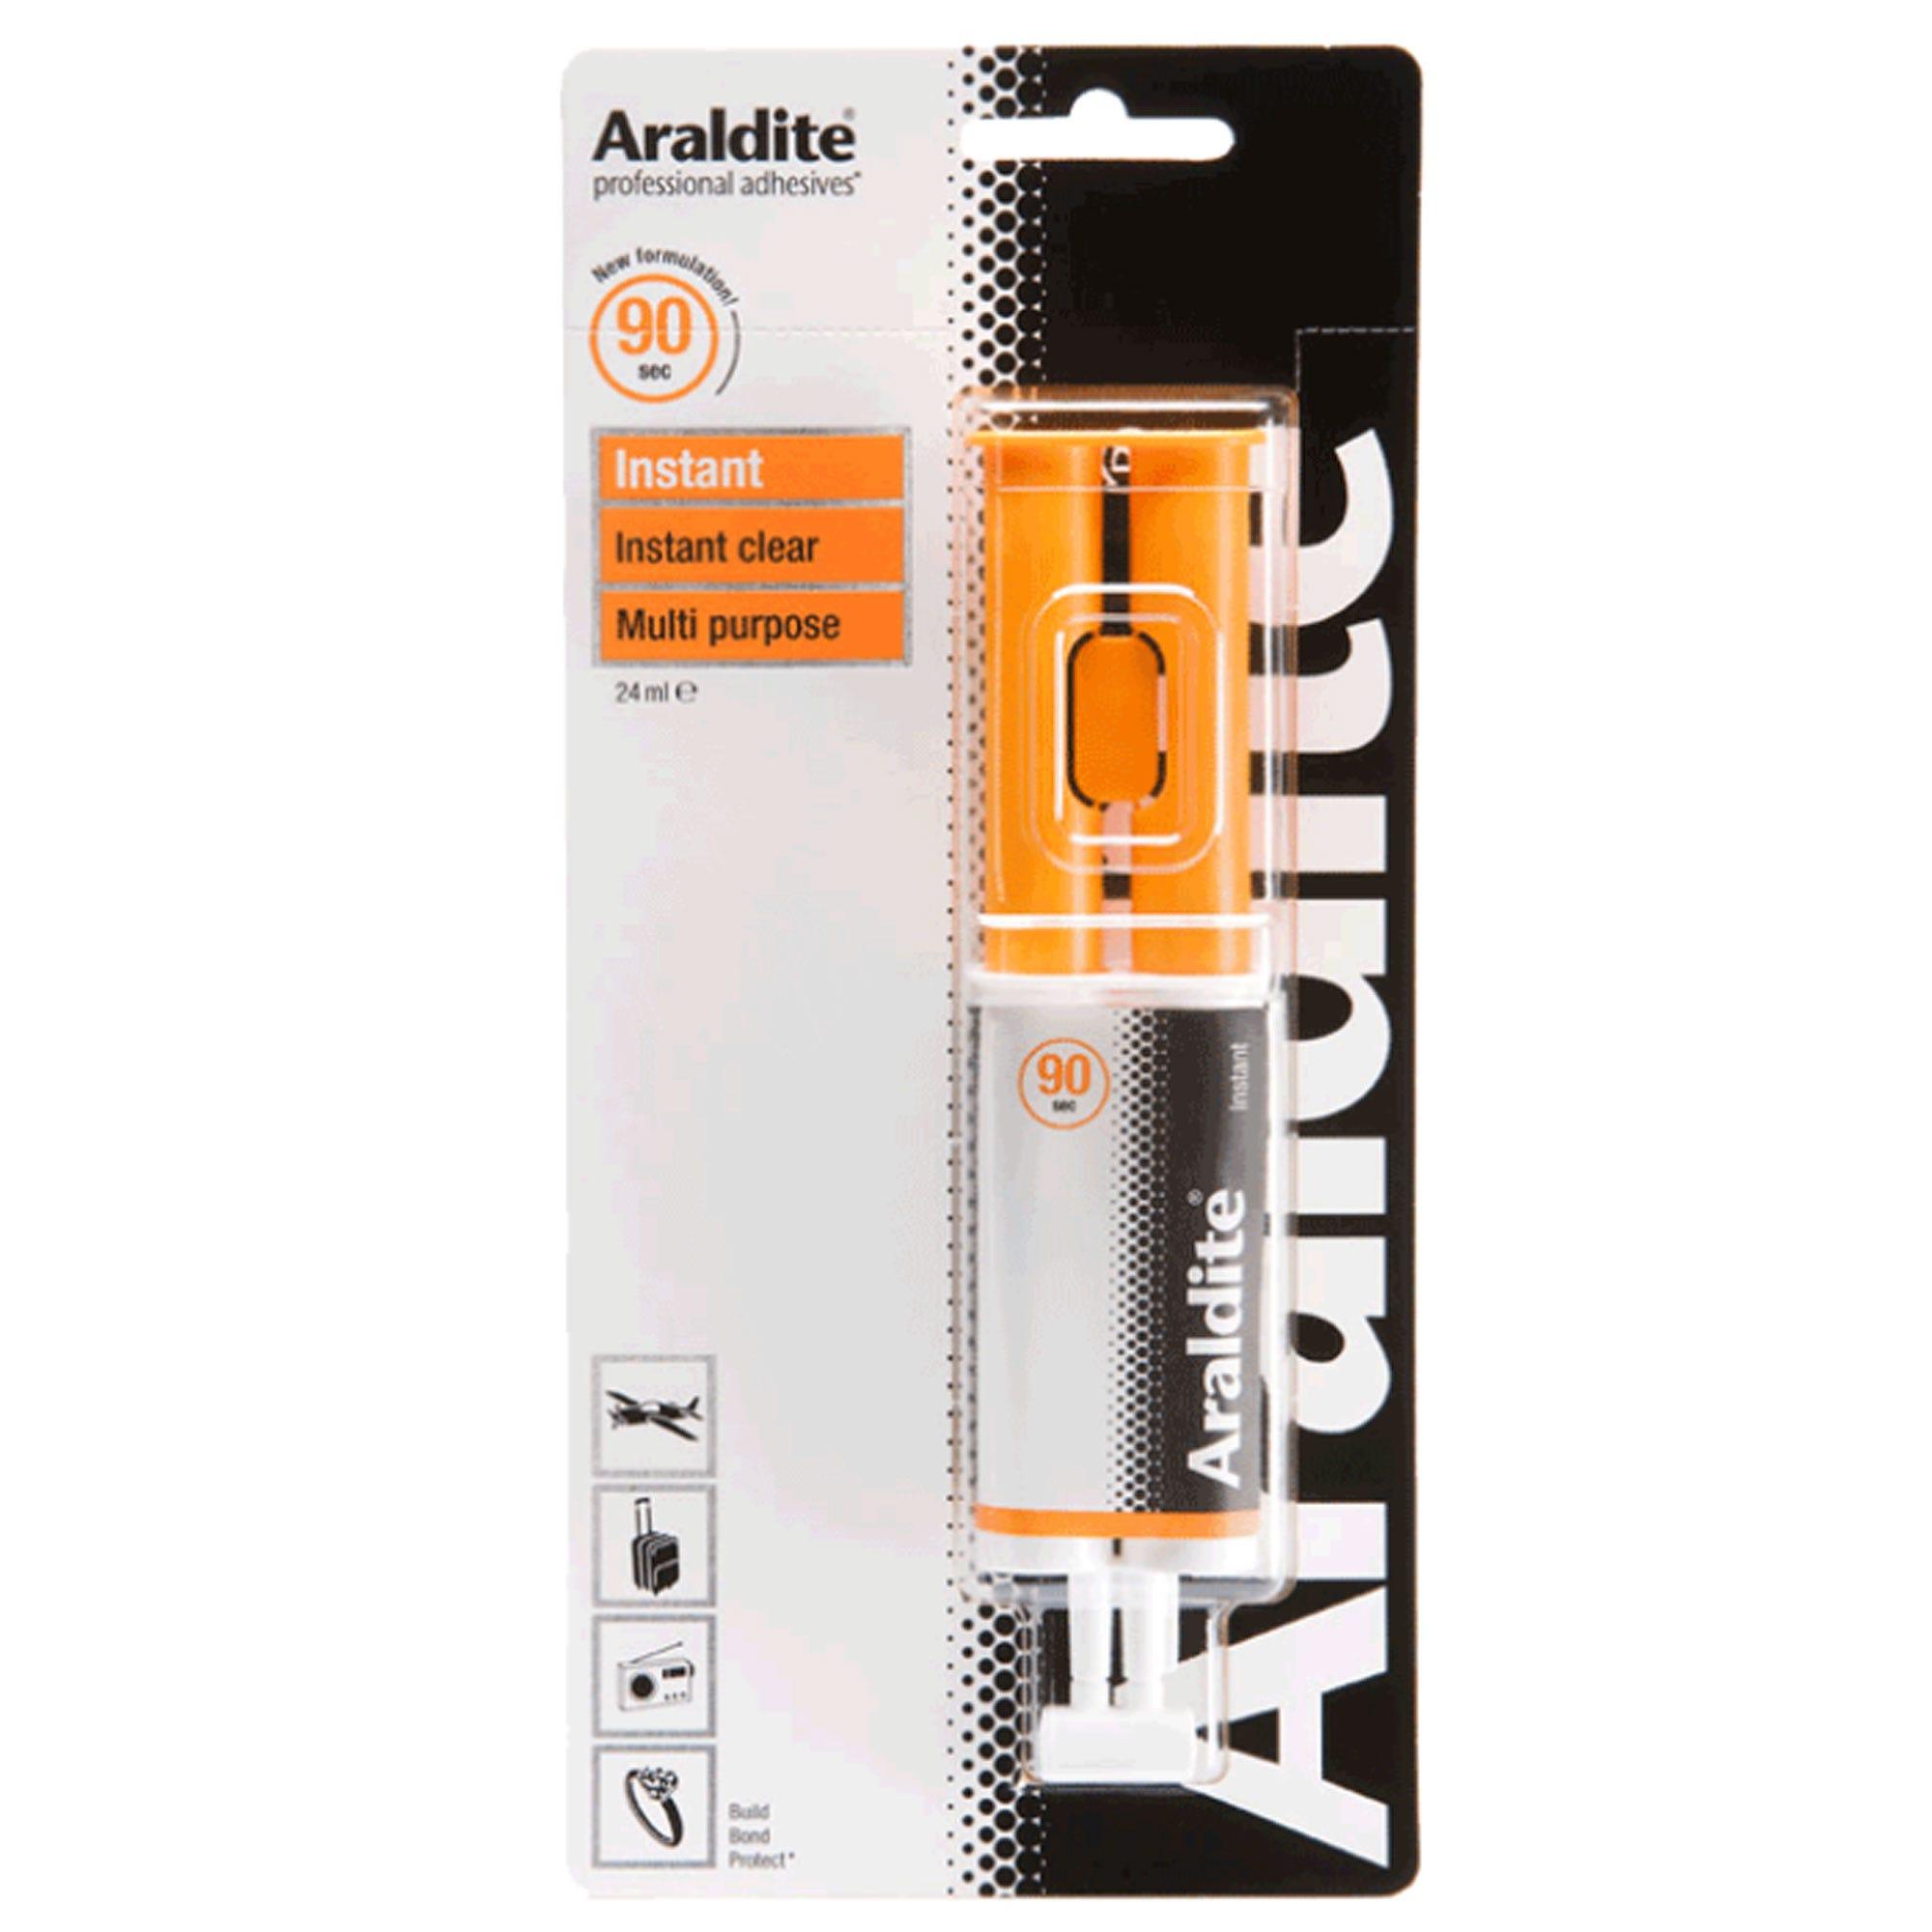 Image of Araldite Instant 24ml Syringe